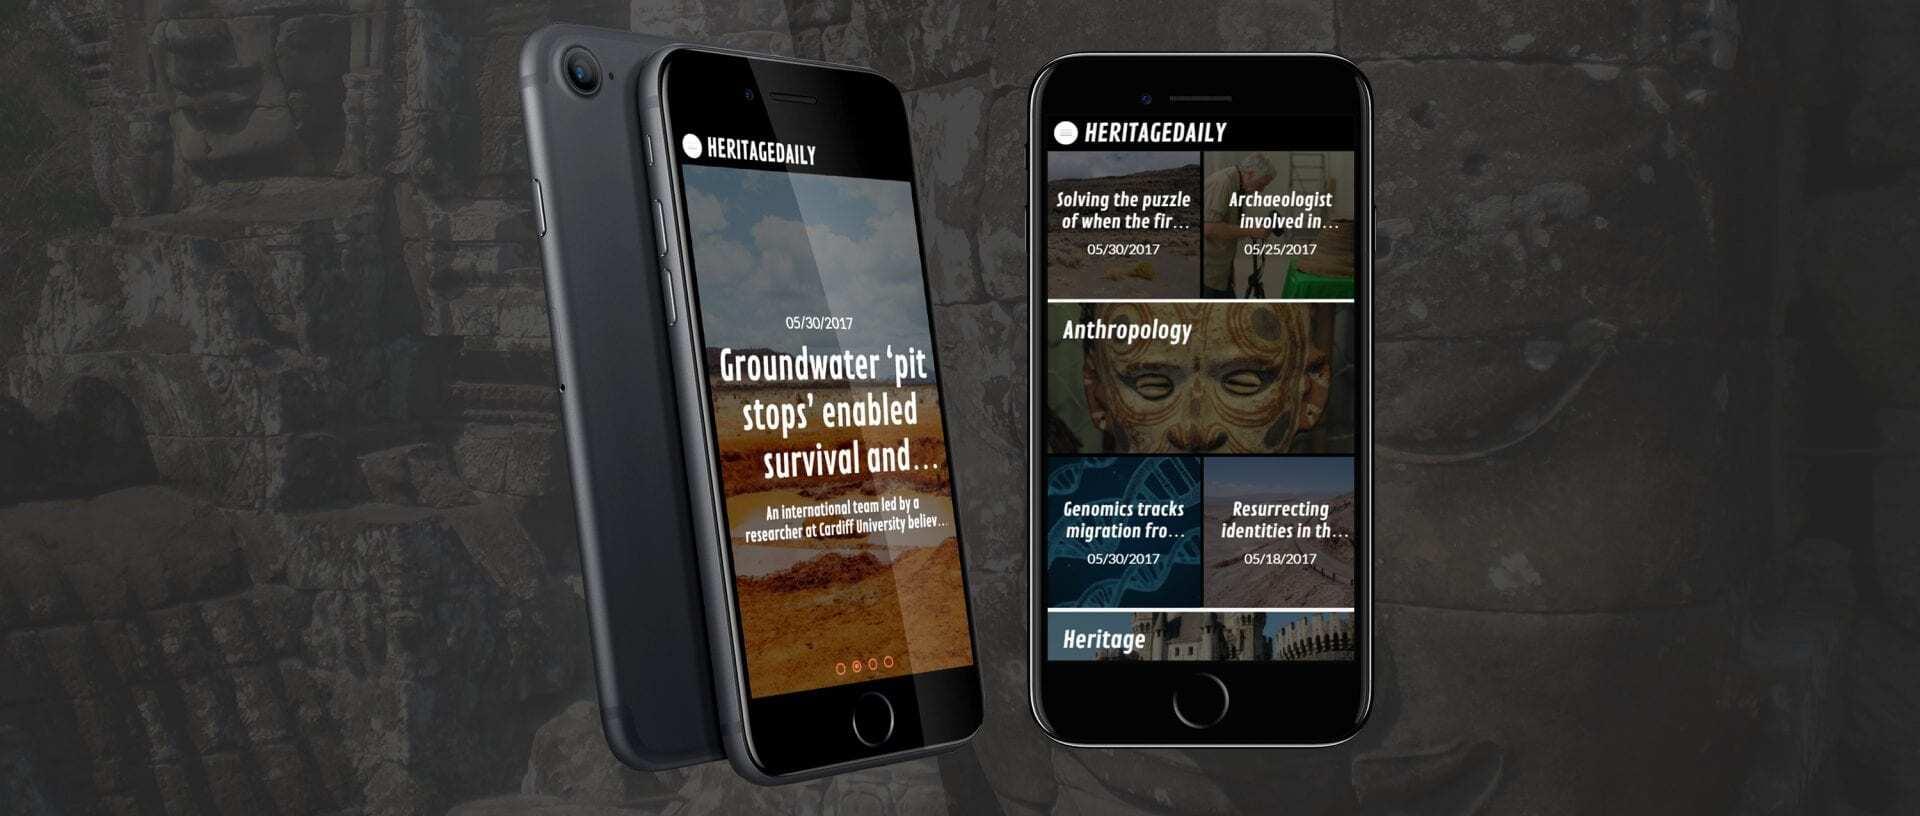 HeritageDaily App - HeritageDaily - Archaeology News